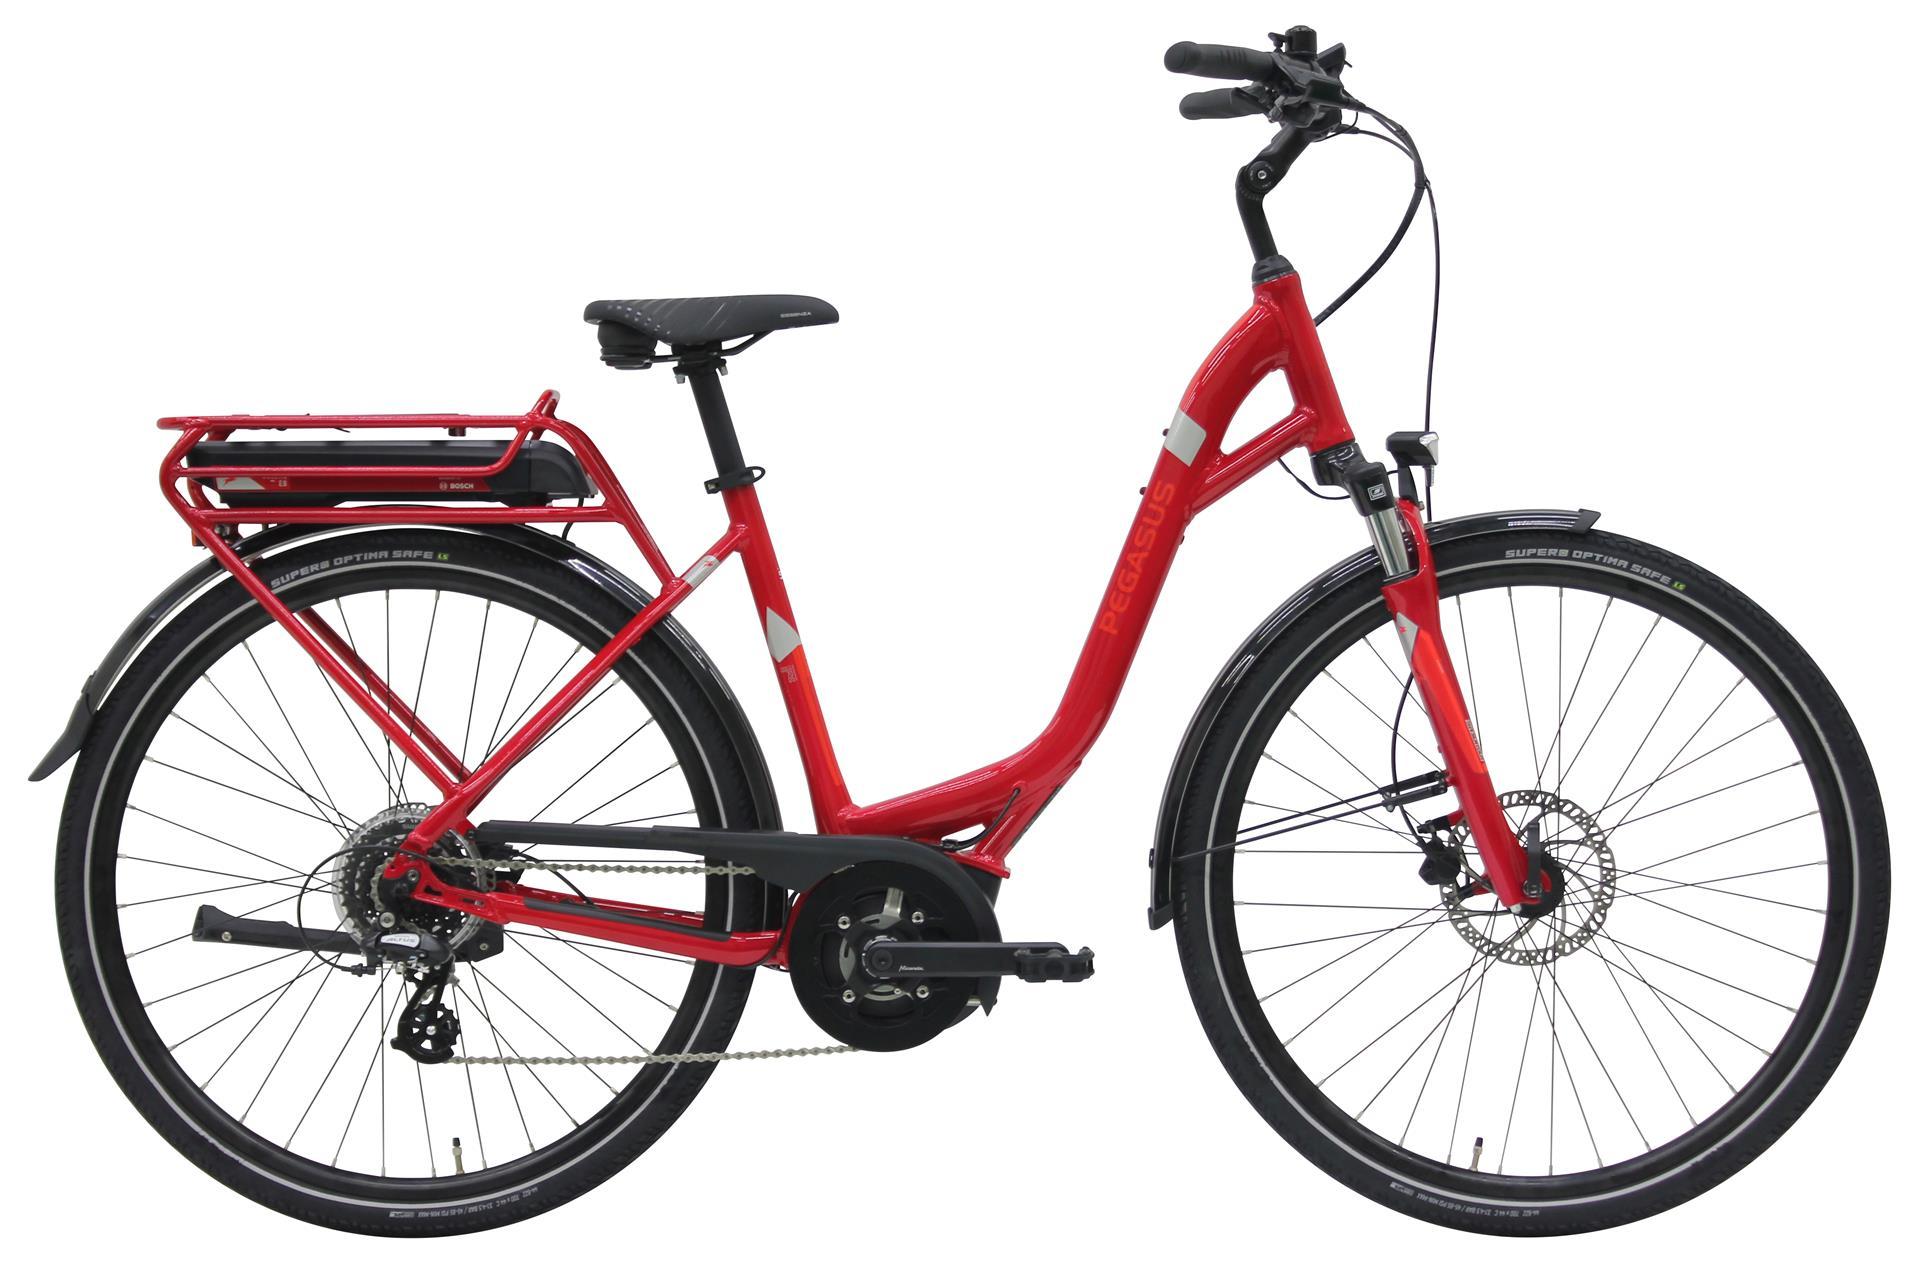 pegasus solero e8 11 ah damen rot 2019 e bikes damen e. Black Bedroom Furniture Sets. Home Design Ideas